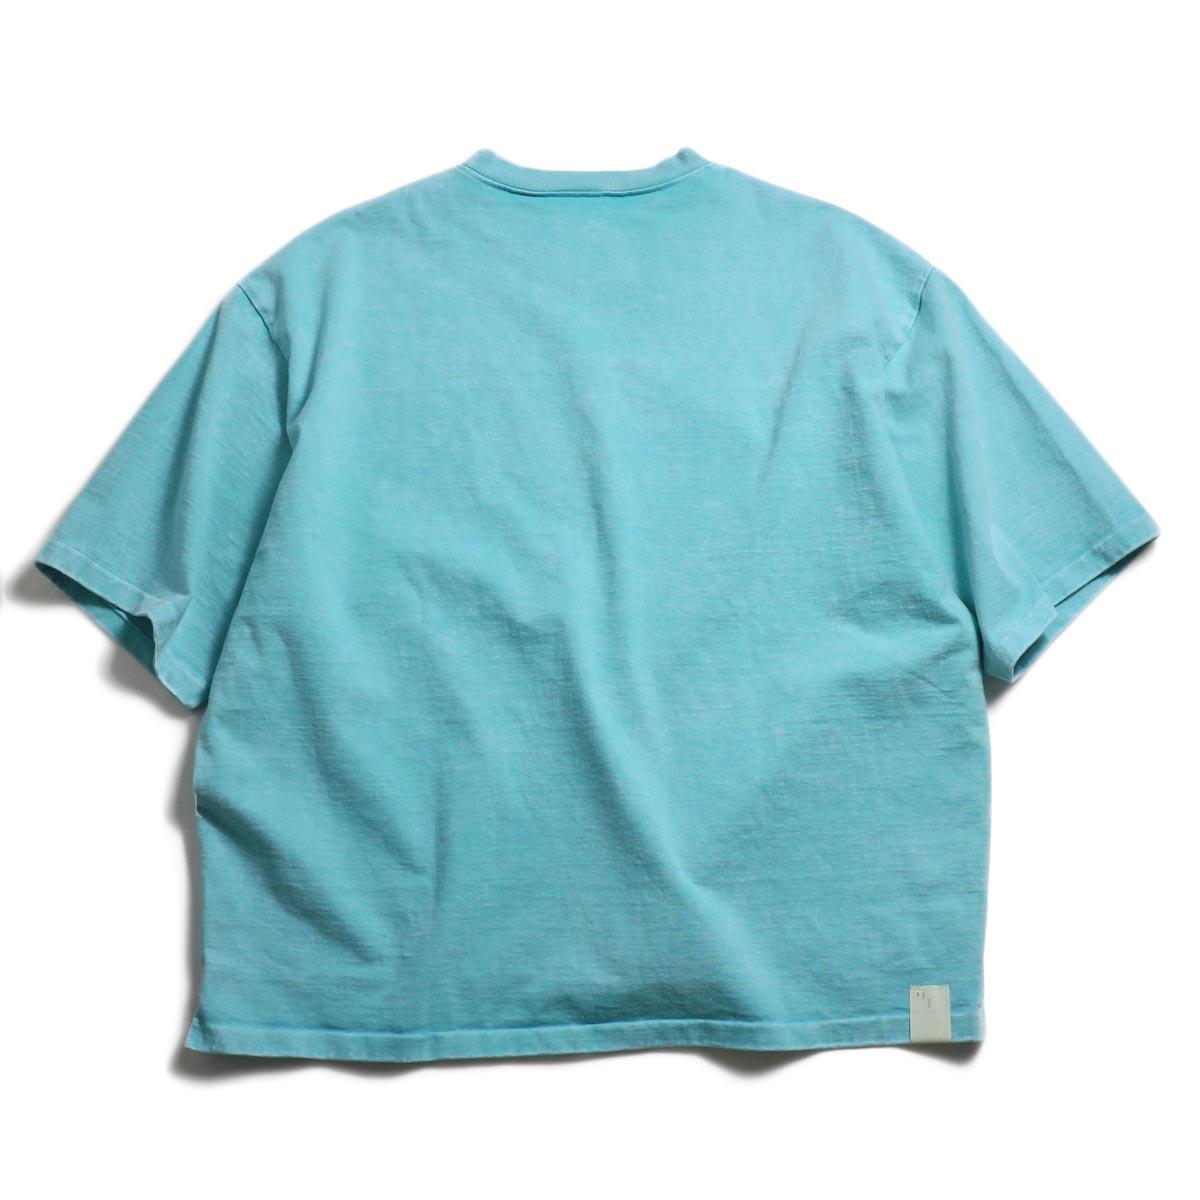 N.HOOLYWOOD × Gramicci  / 191-CS27-024 Short Sleeve Tee -Turquoise 背面